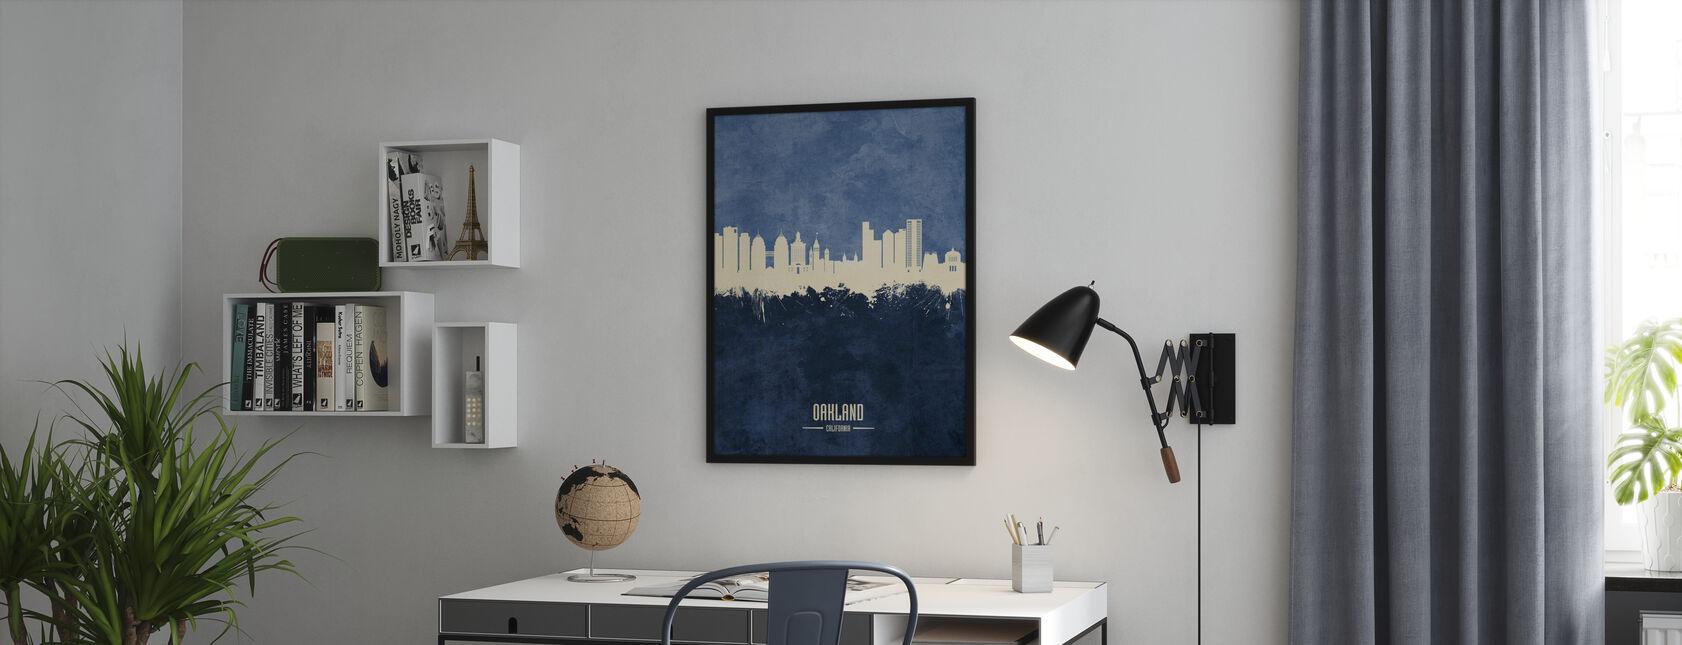 Oakland California Skyline - Plakat - Kontor